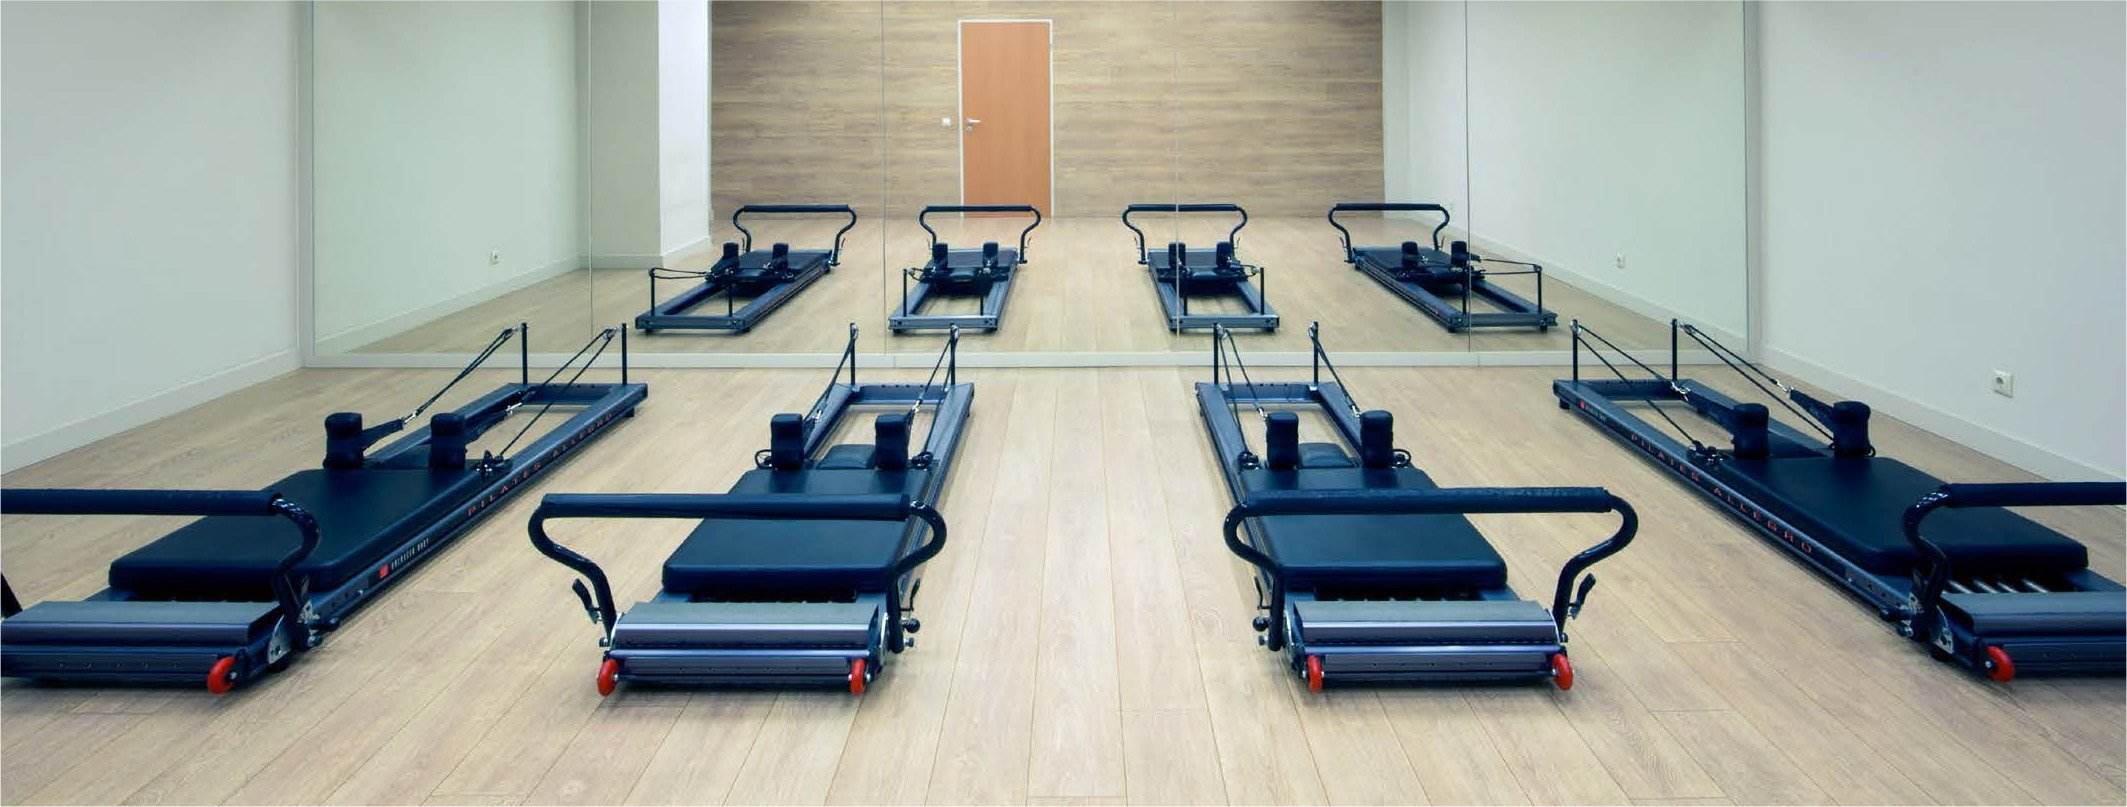 Pilates Allegro - изображение